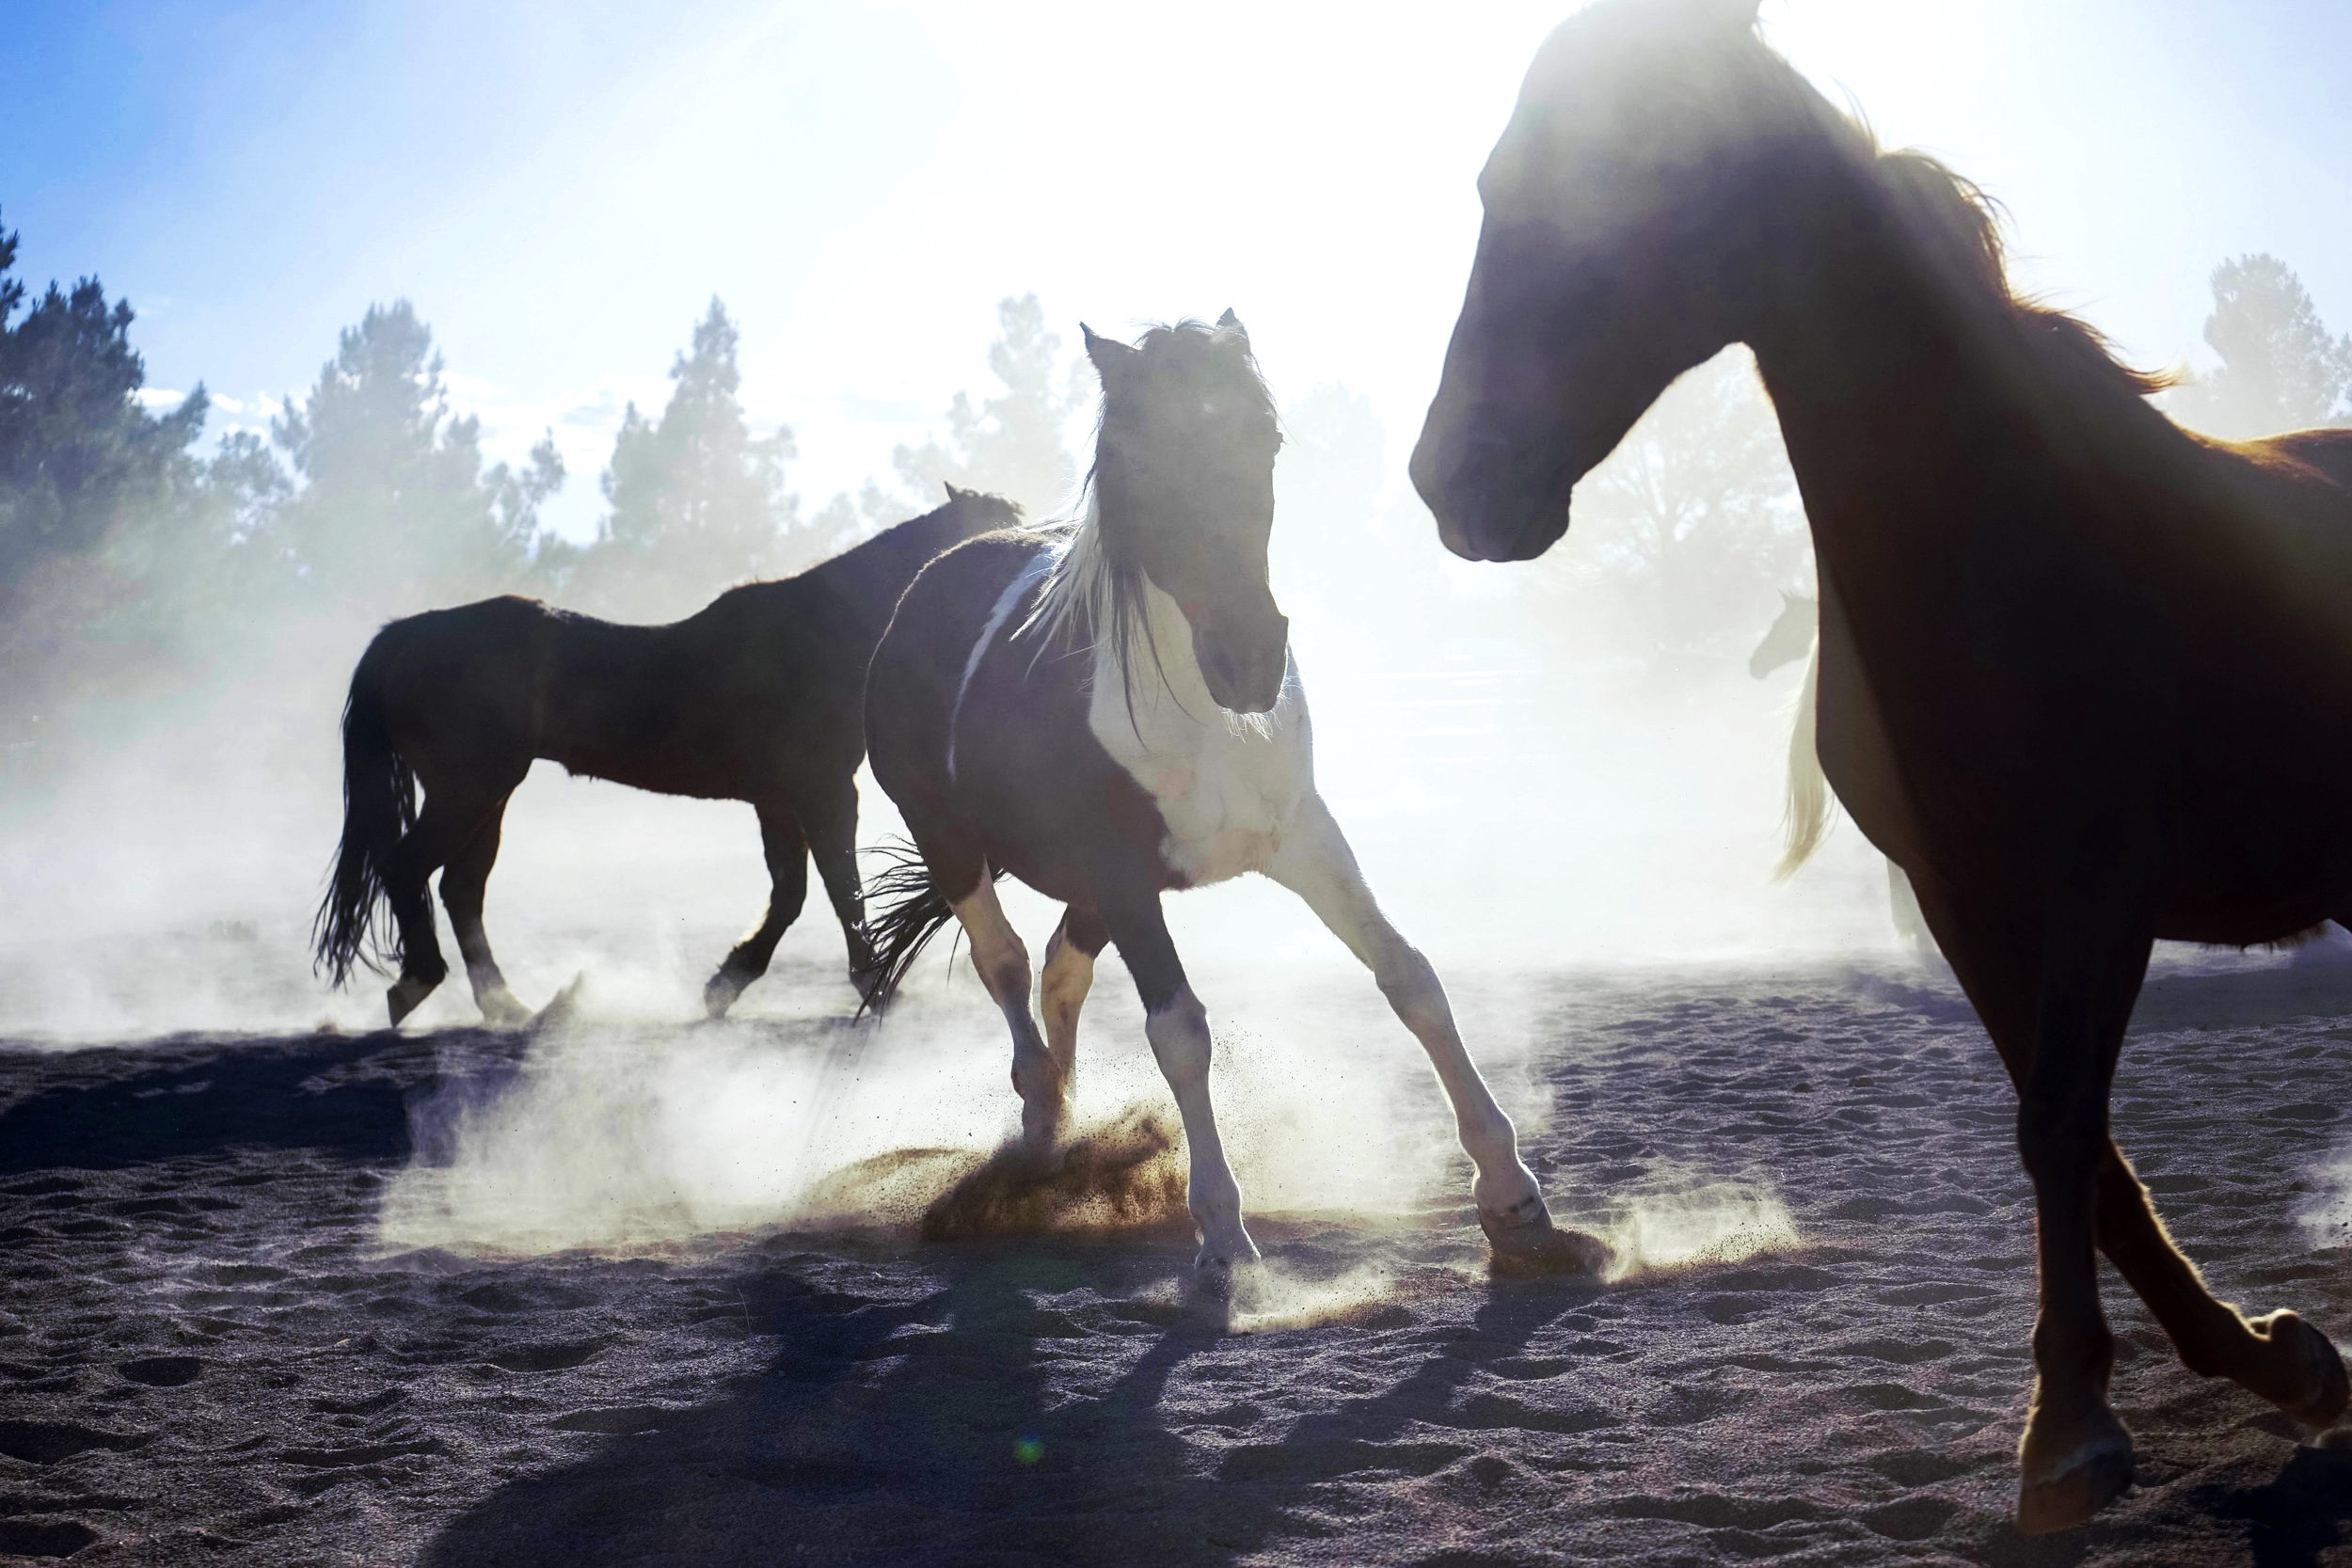 Horses at play, Las Vegas, Nevada 2019